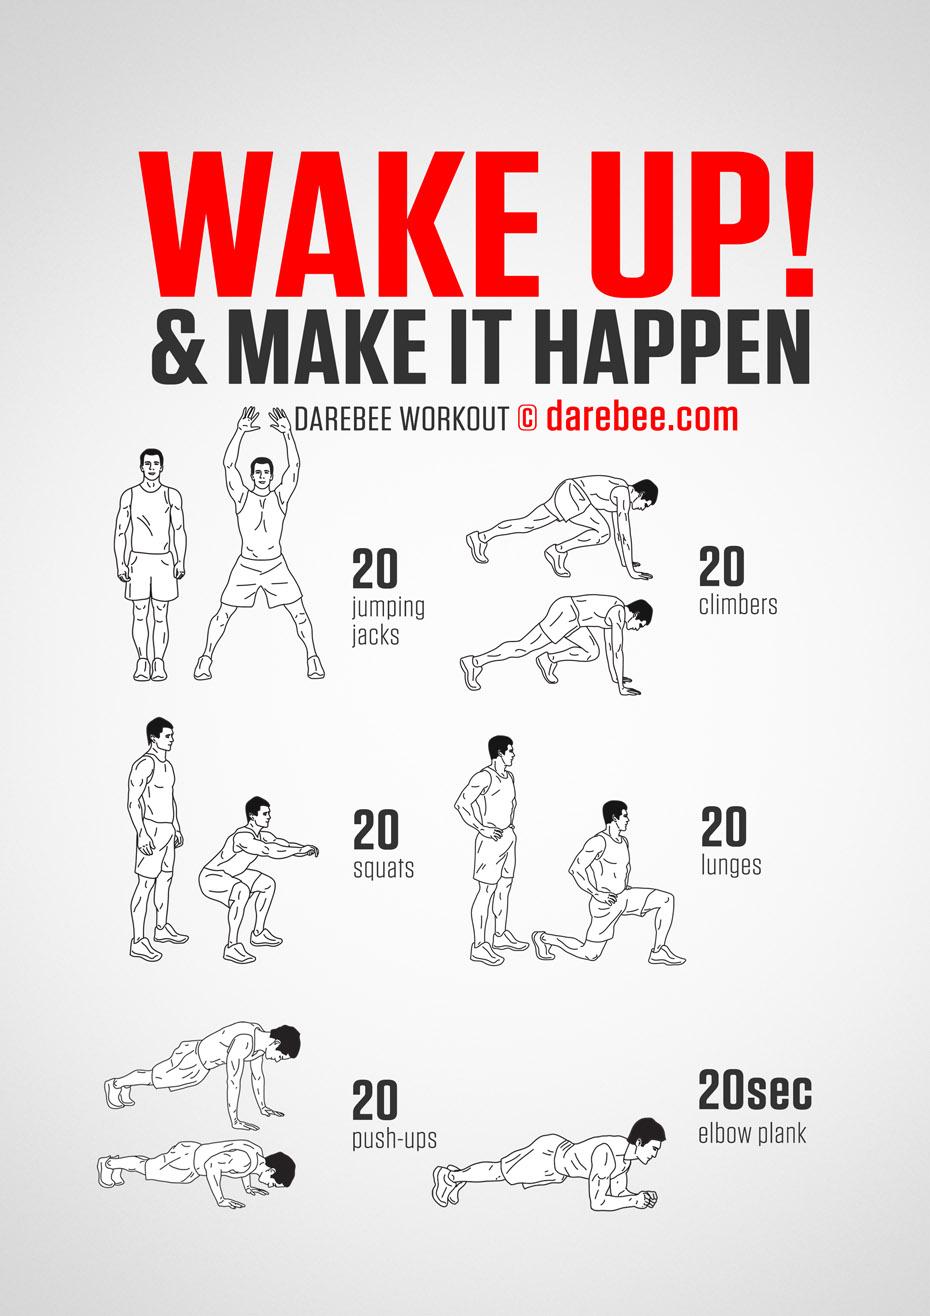 Wake up & Make it happen